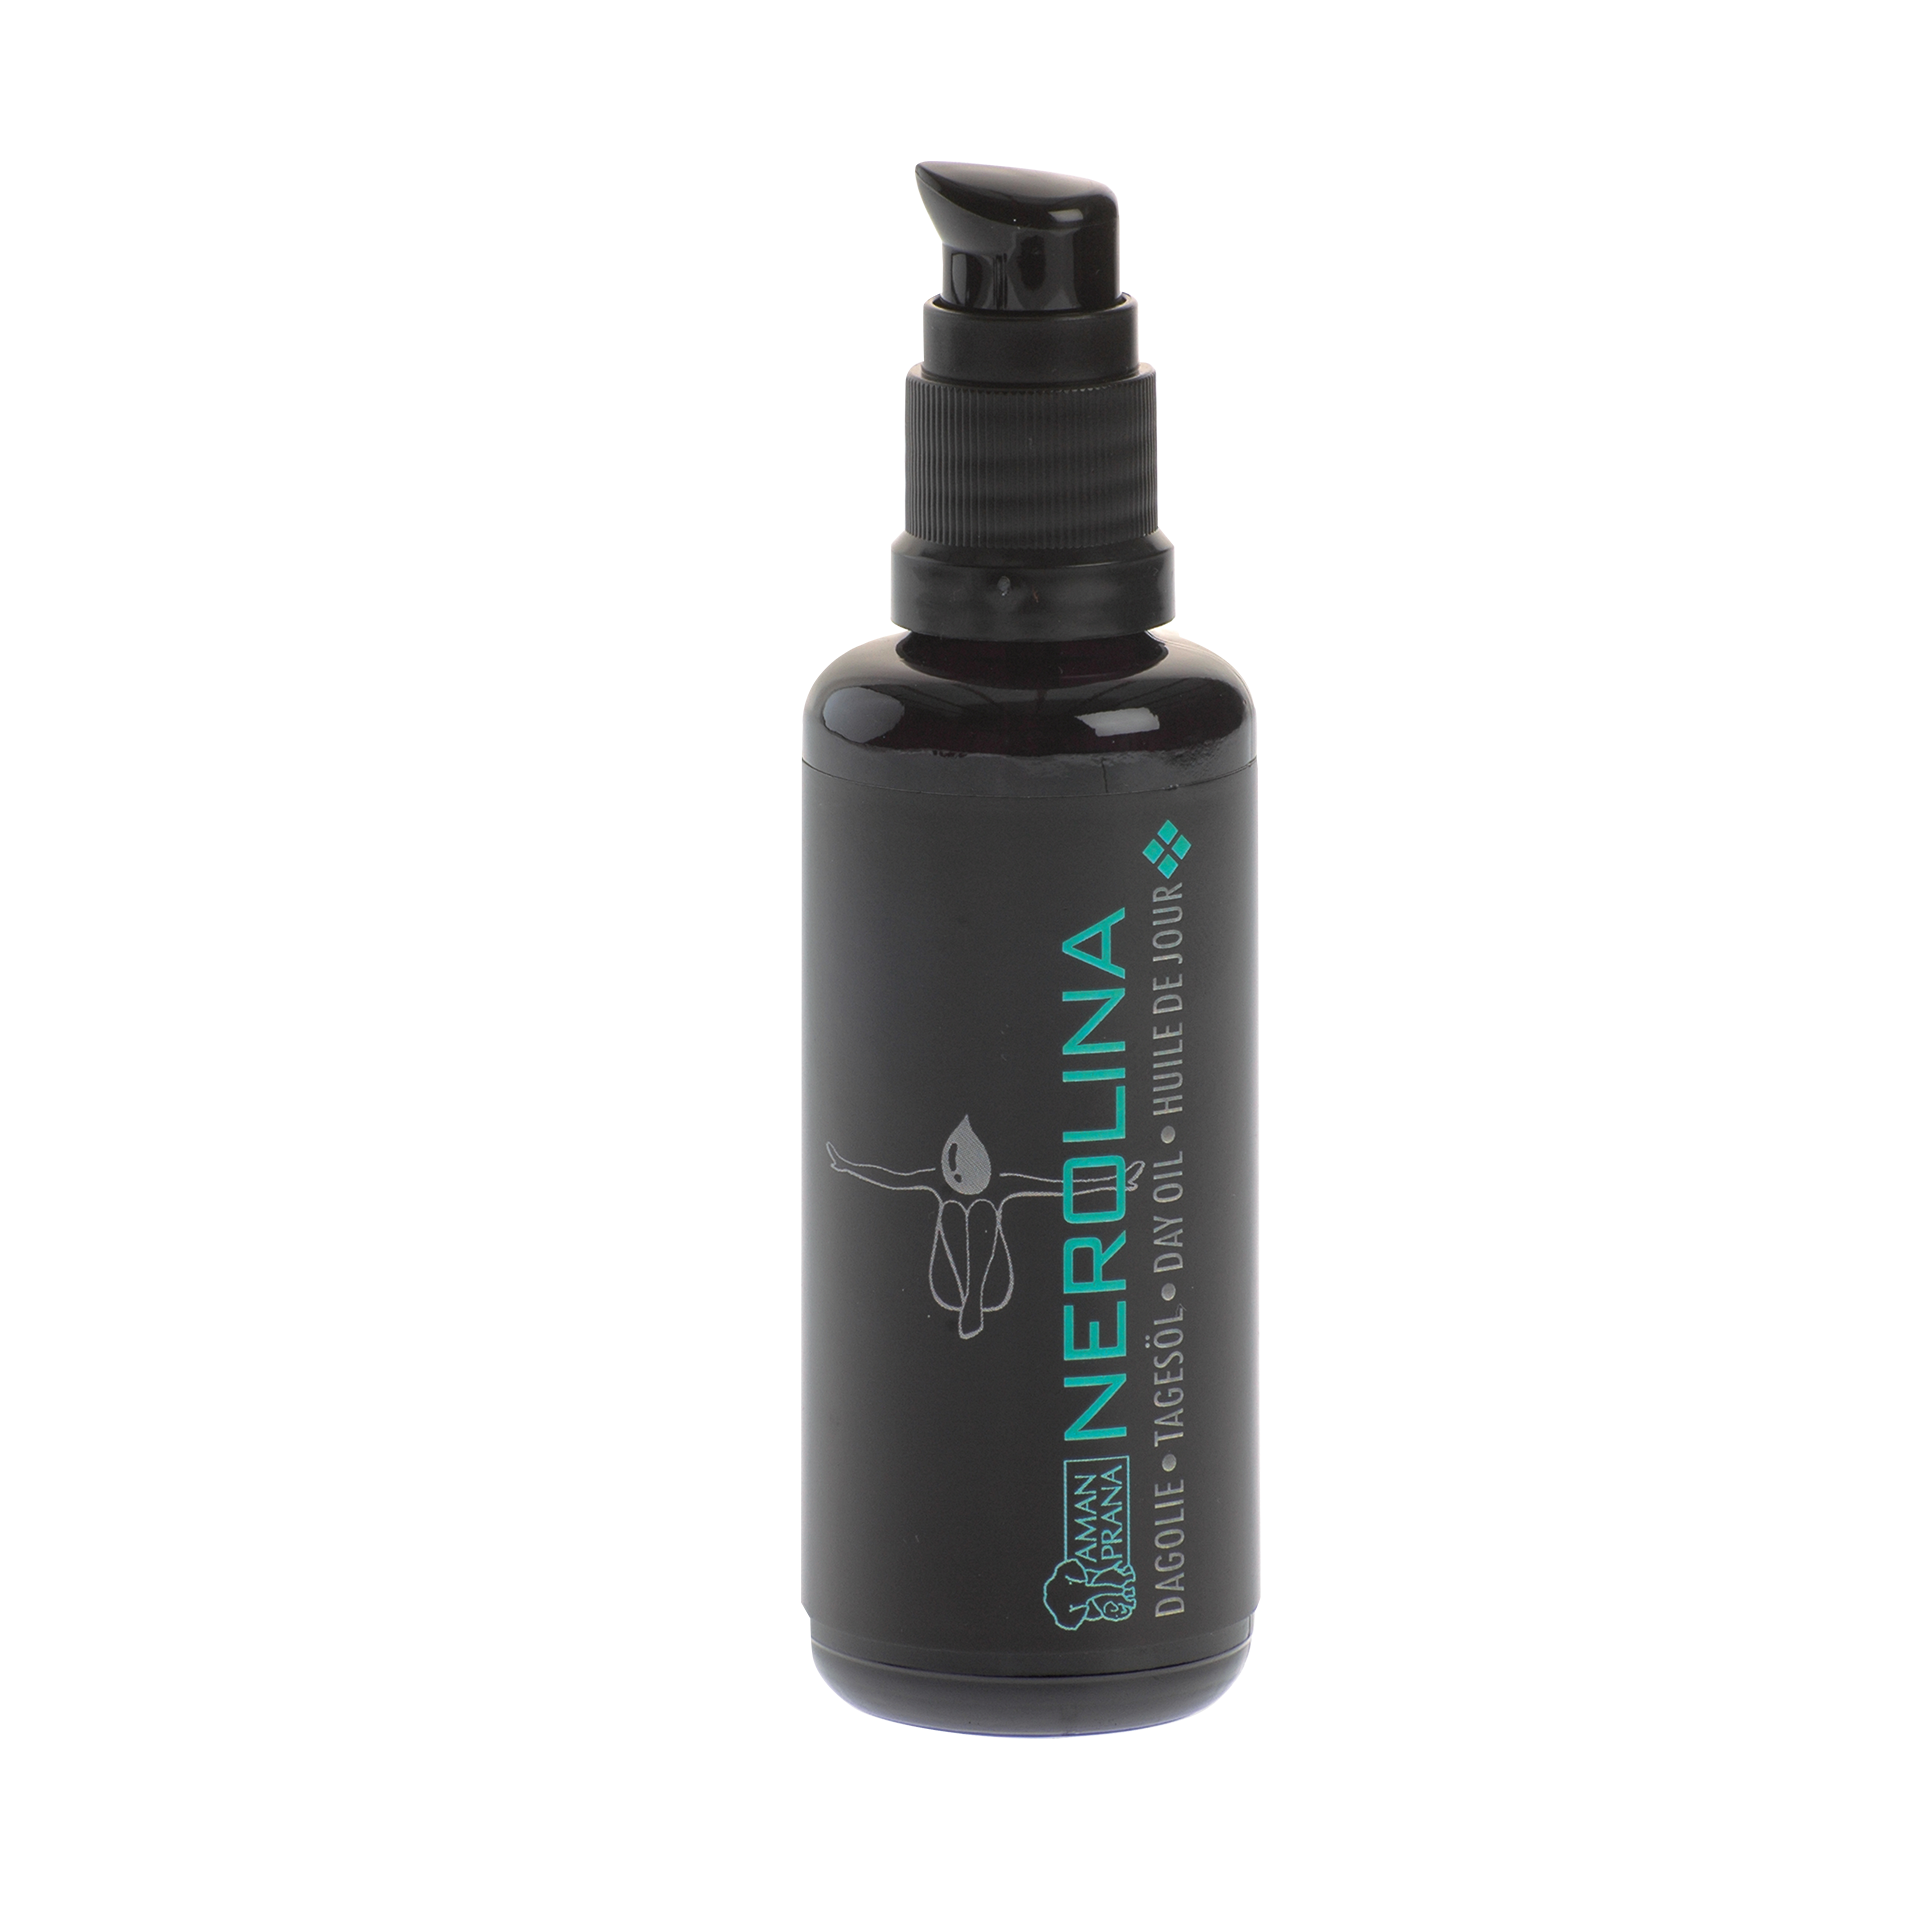 Tagesöl Nerolina, 50 ml